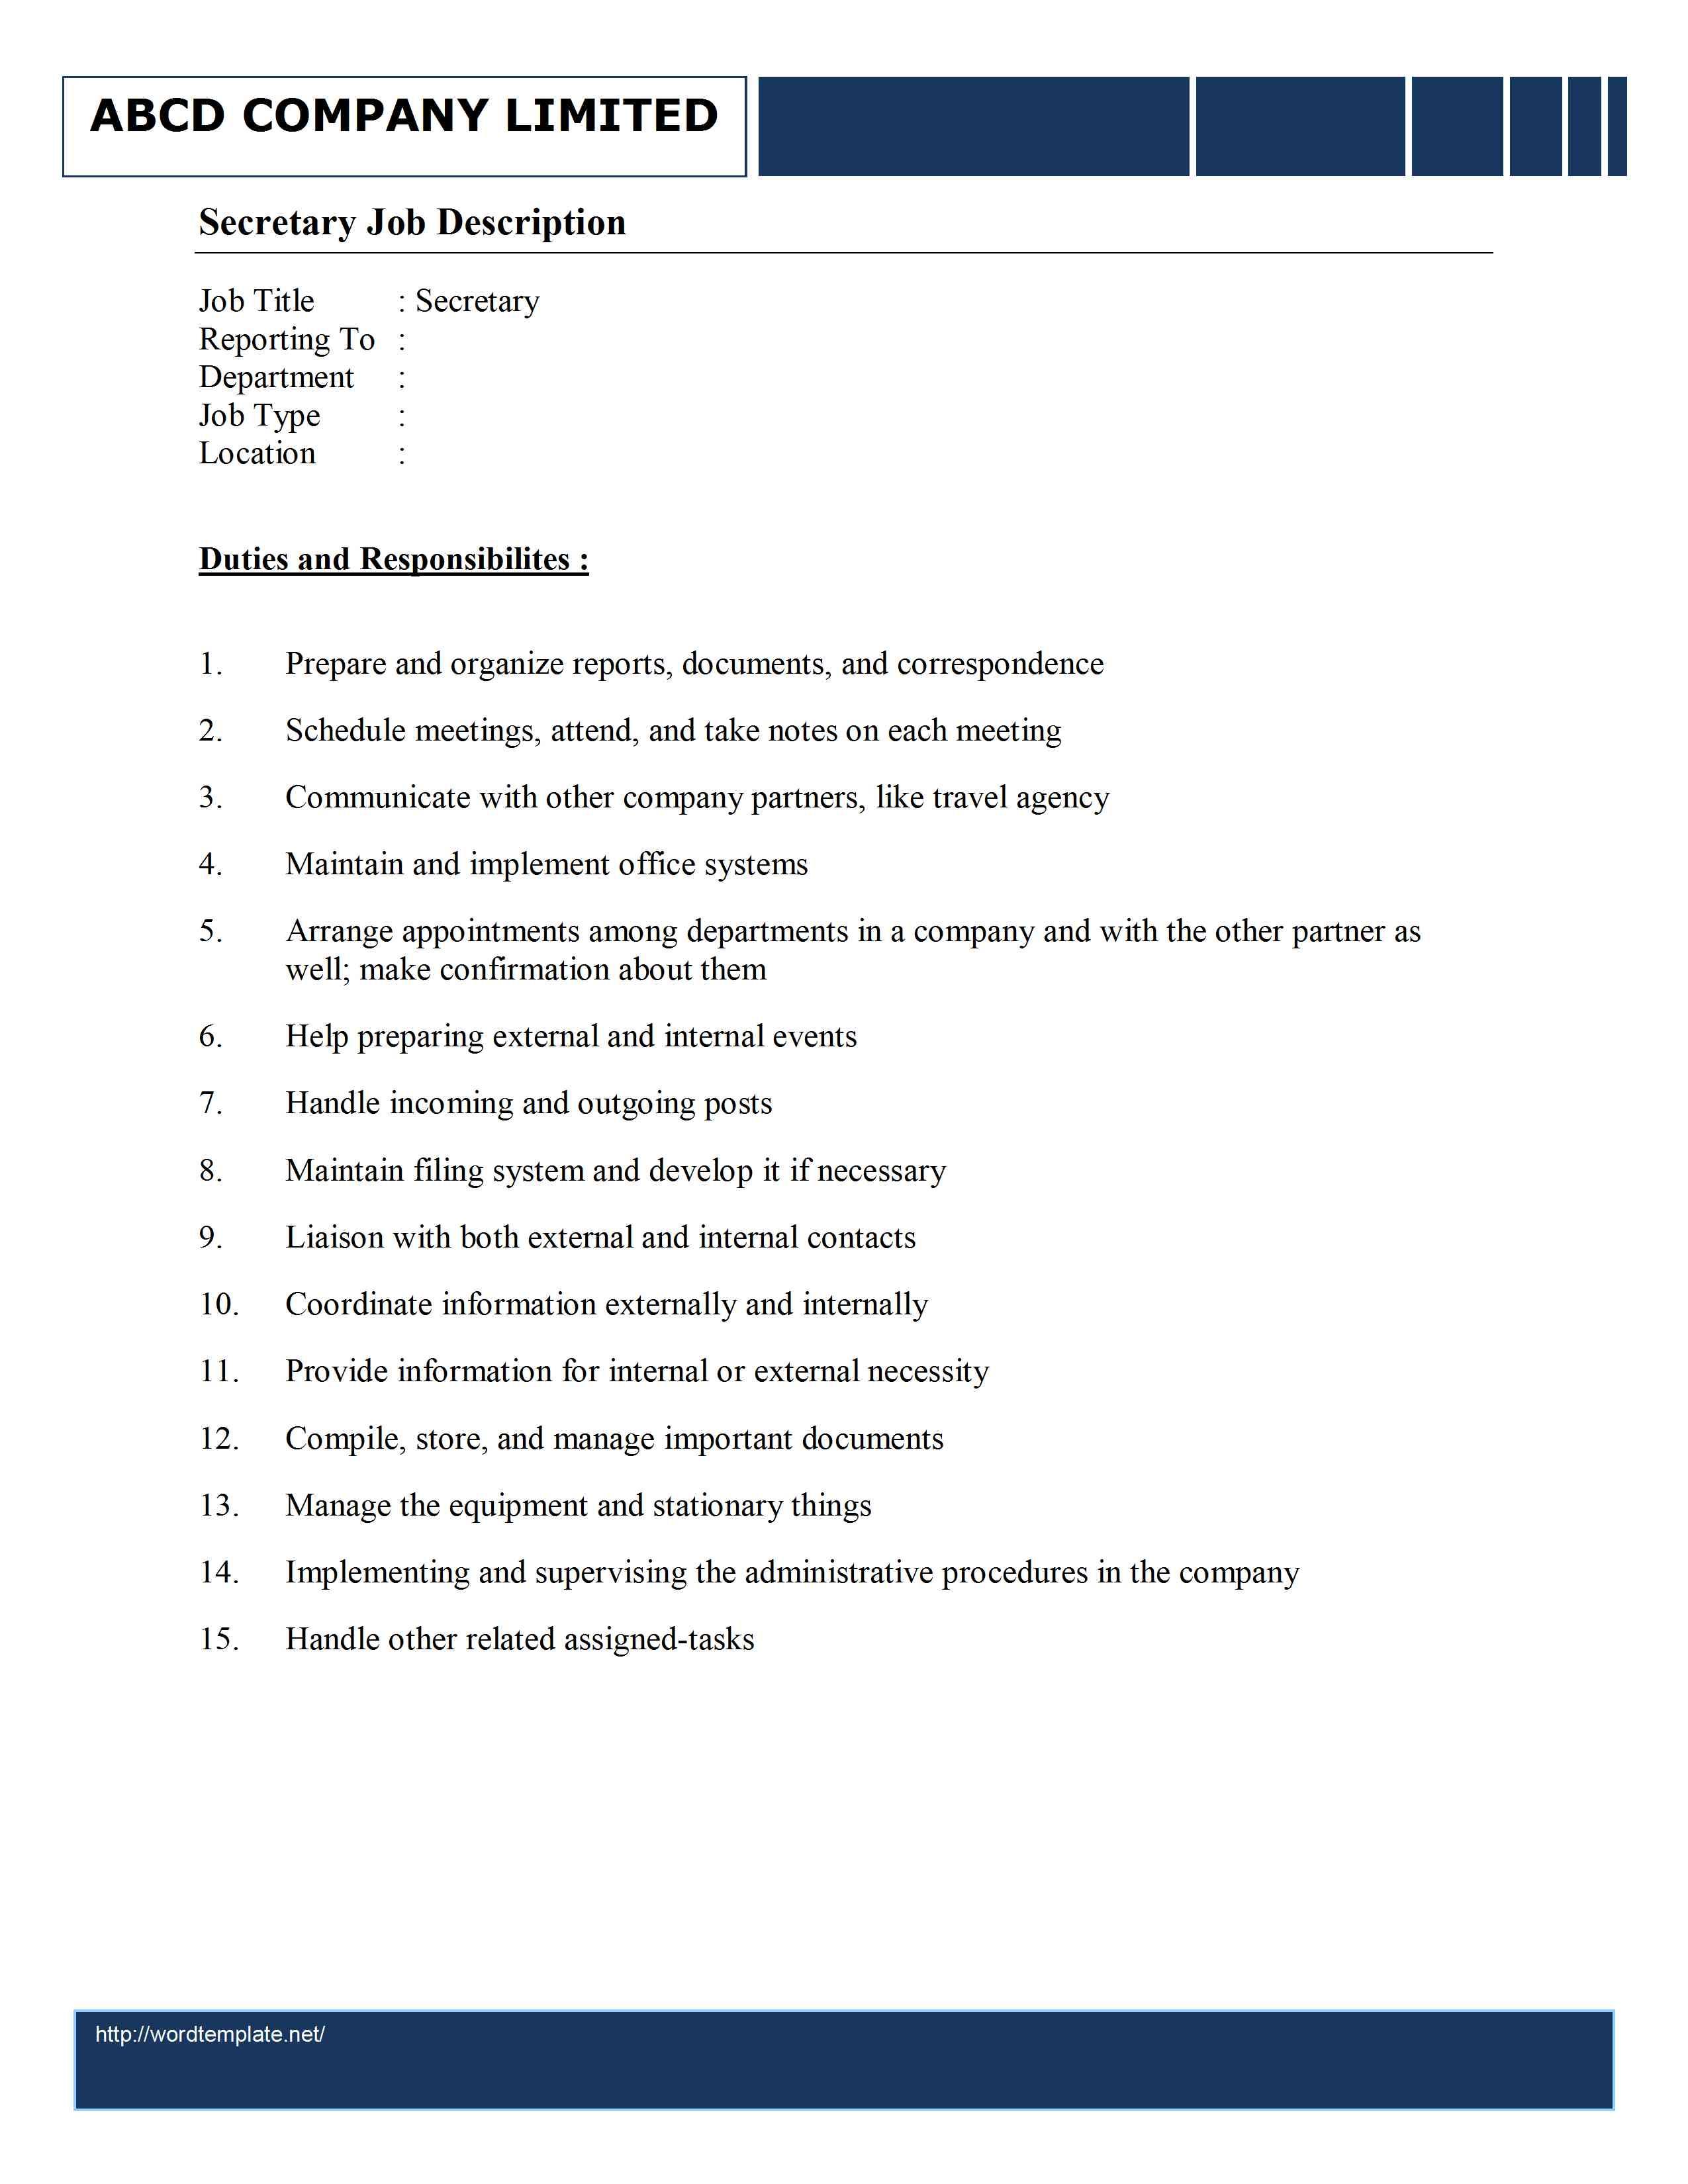 resume job descriptions for waitress sample customer service resume resume job descriptions for waitress job descriptions job description template secretary job description 791x1024 secretary